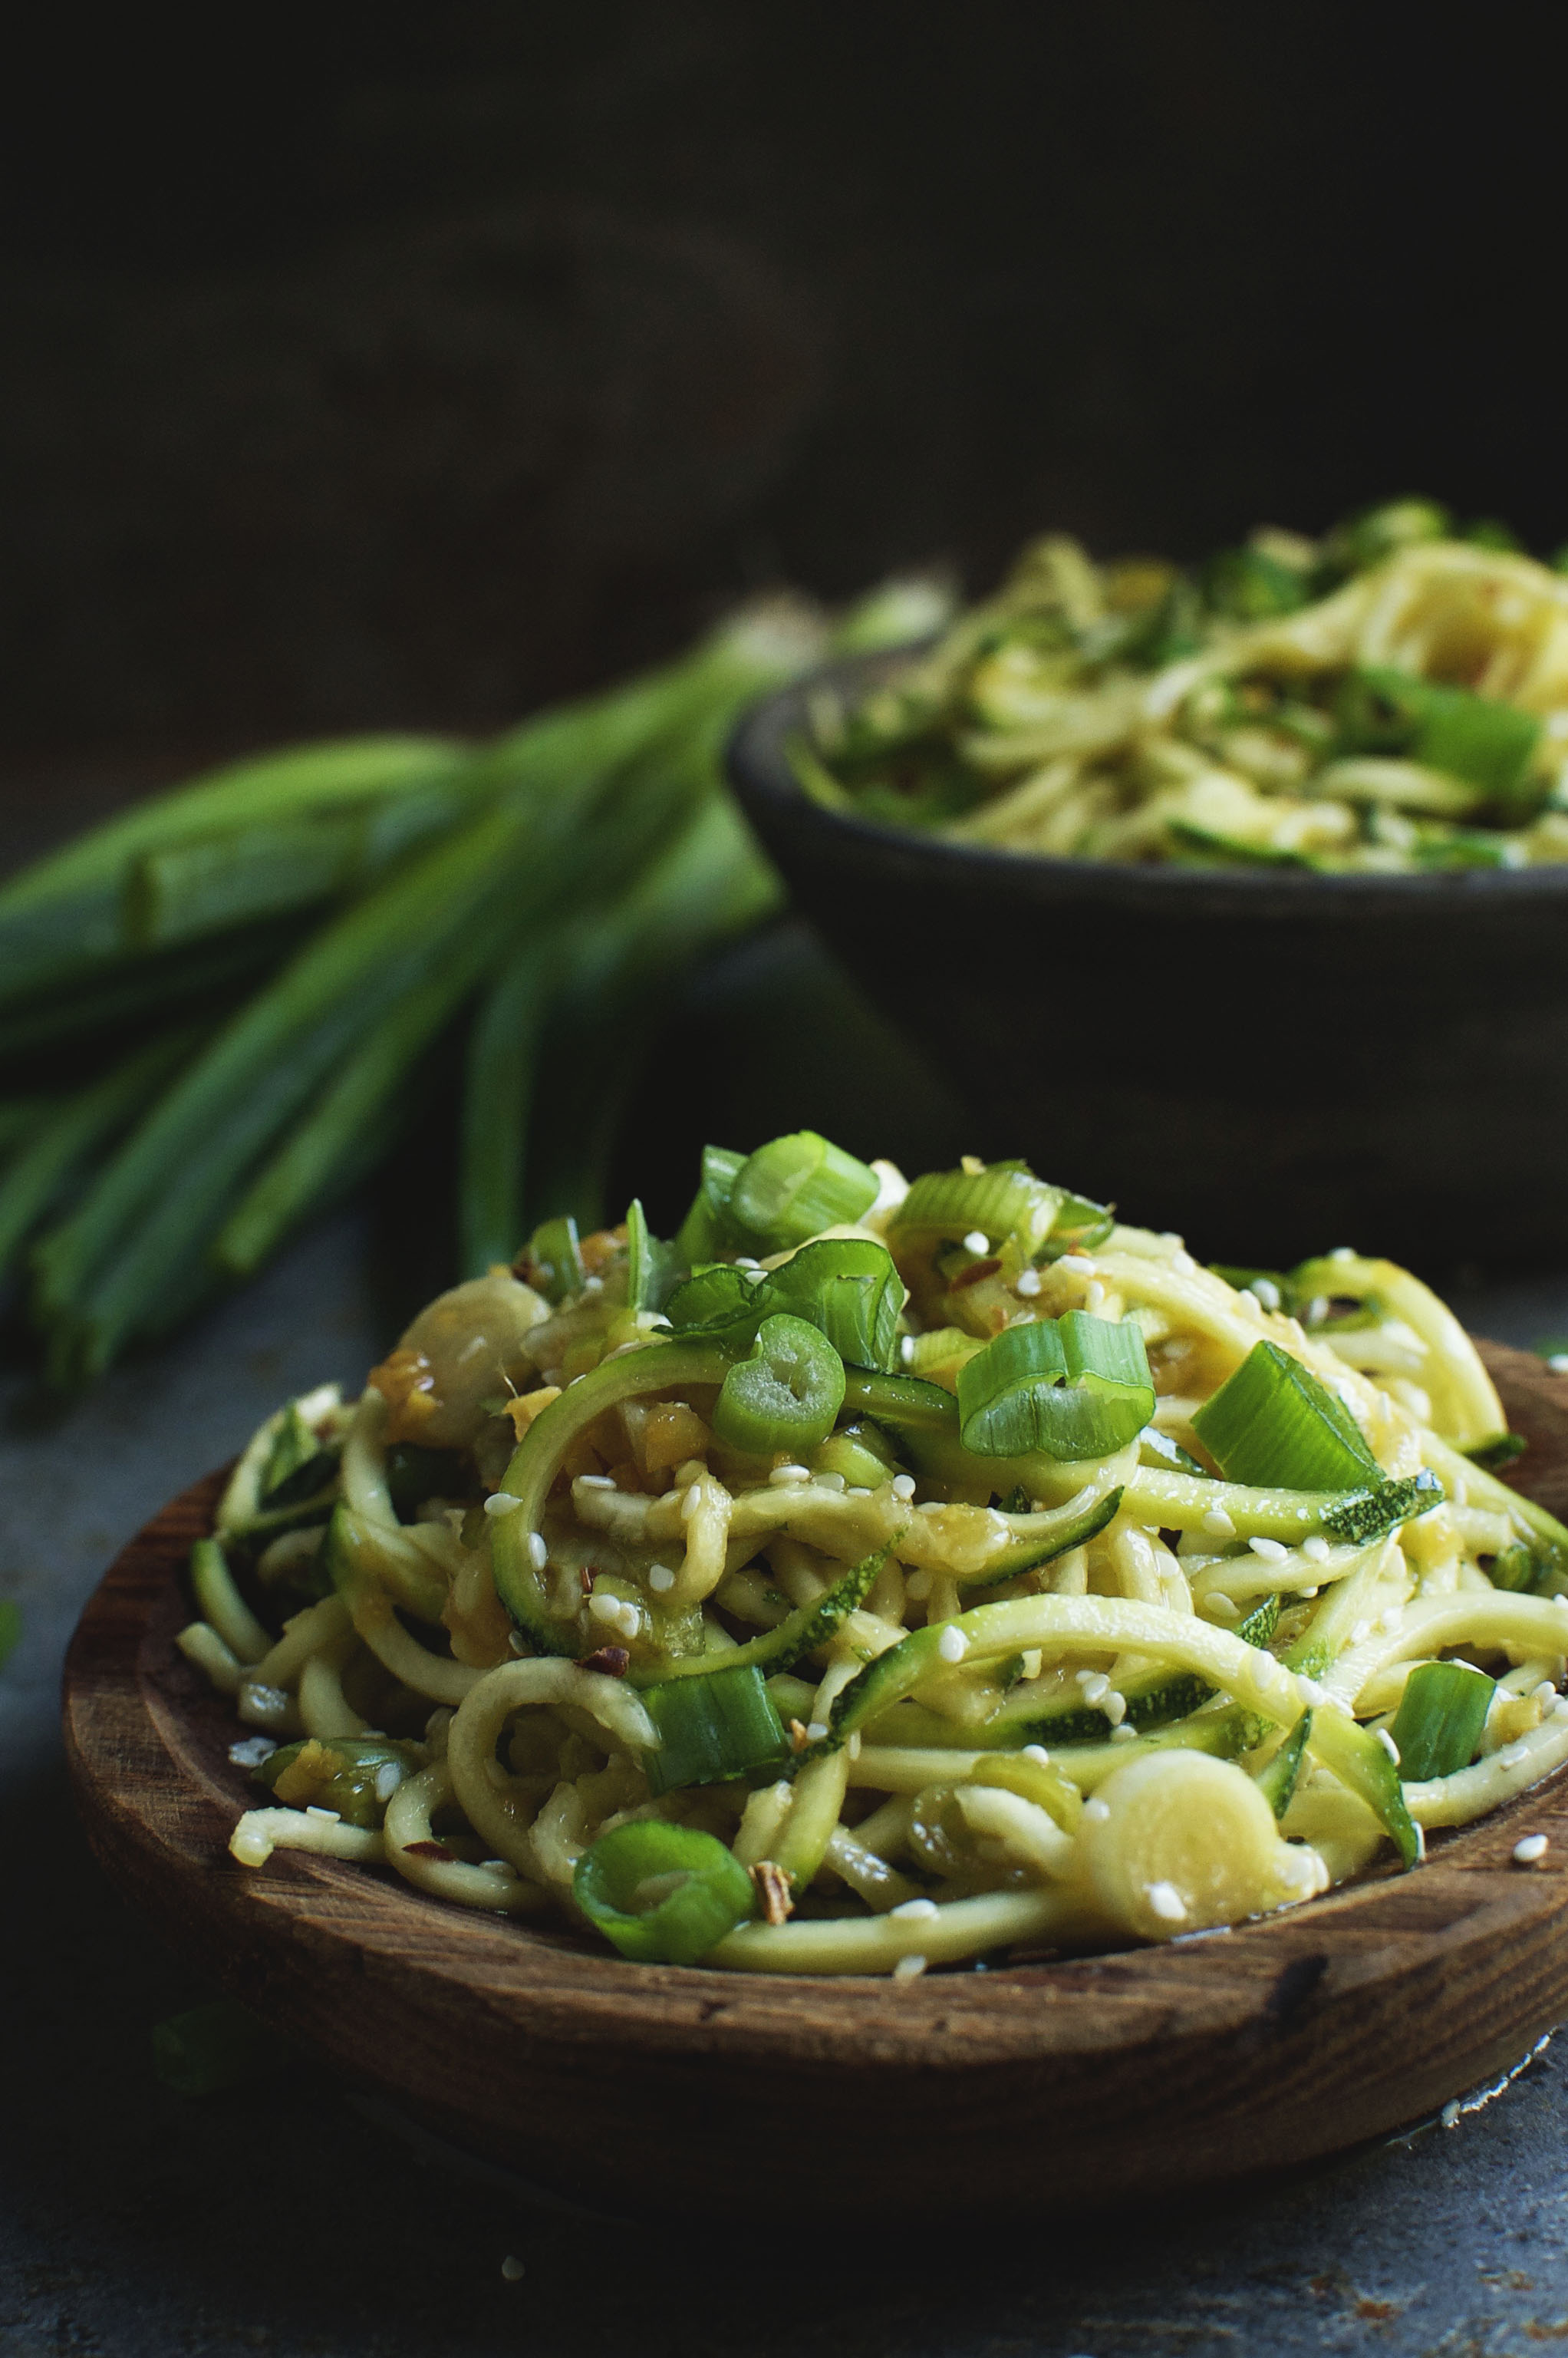 Low carb asian recipe